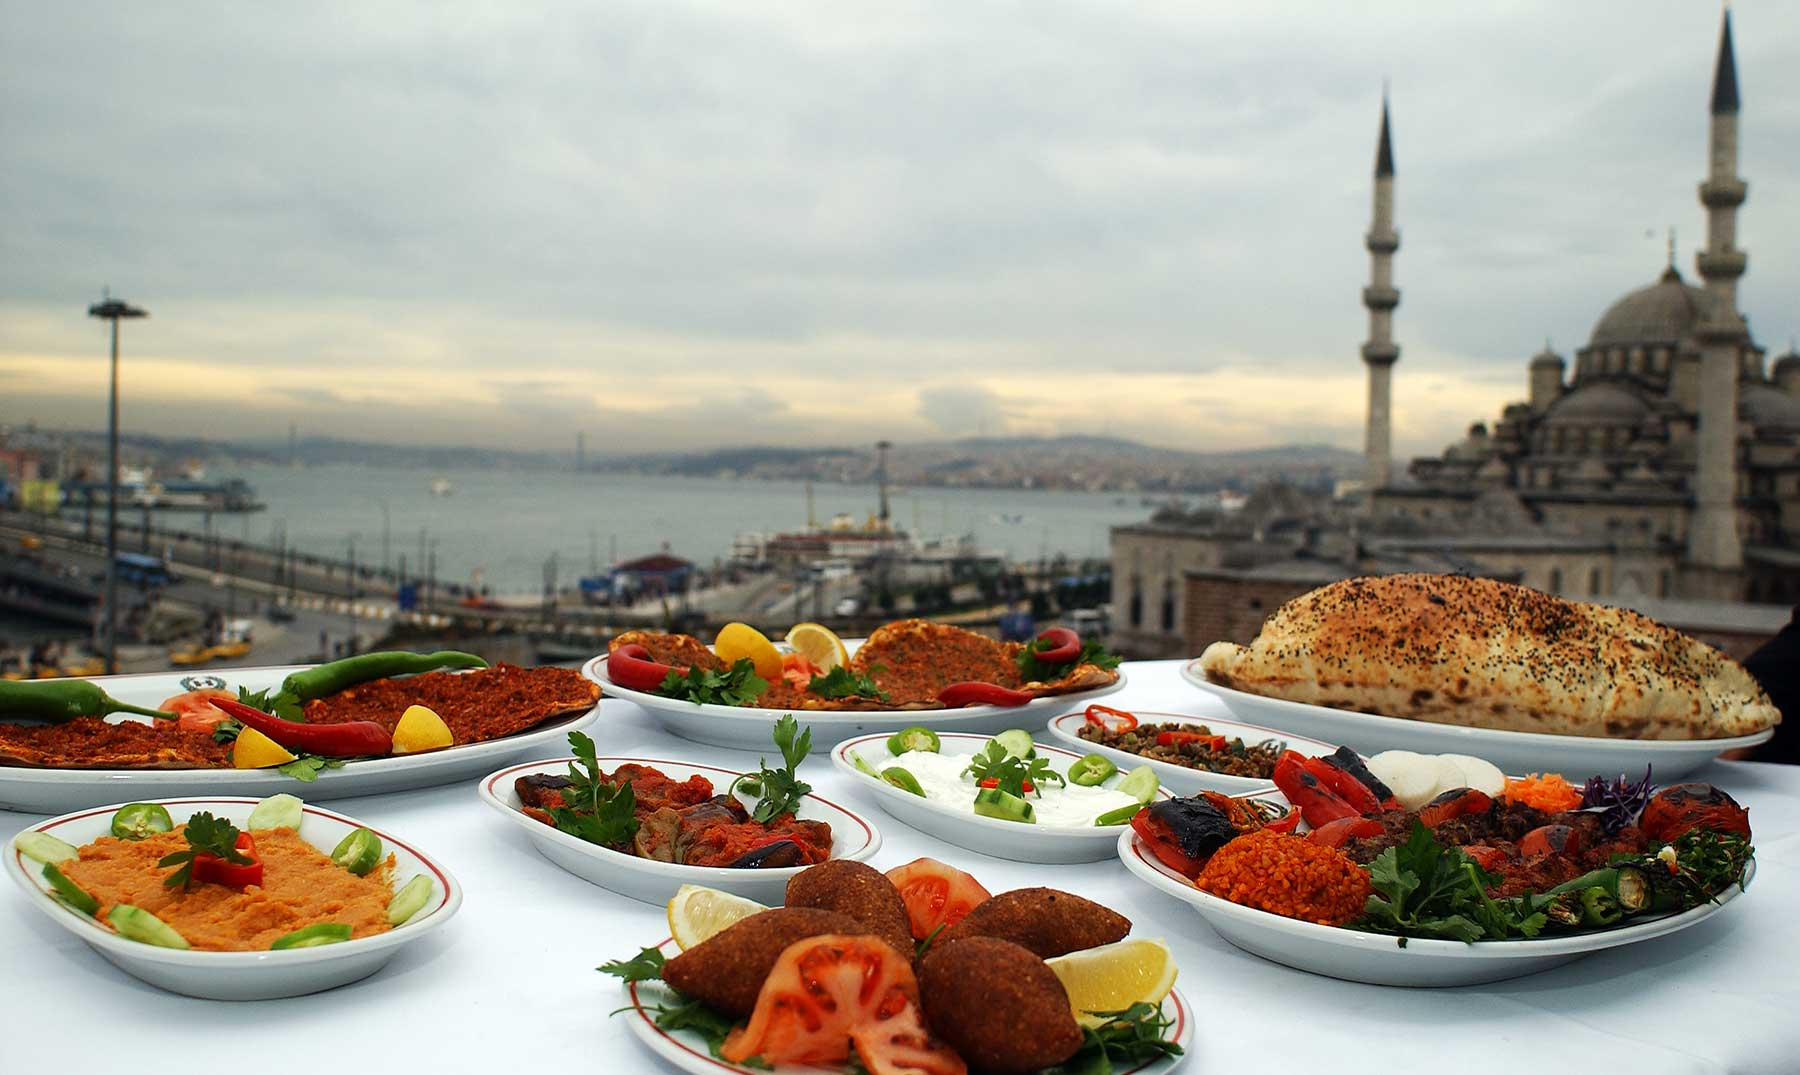 Comida típica de Turquía | 10 Platos Imprescindibles